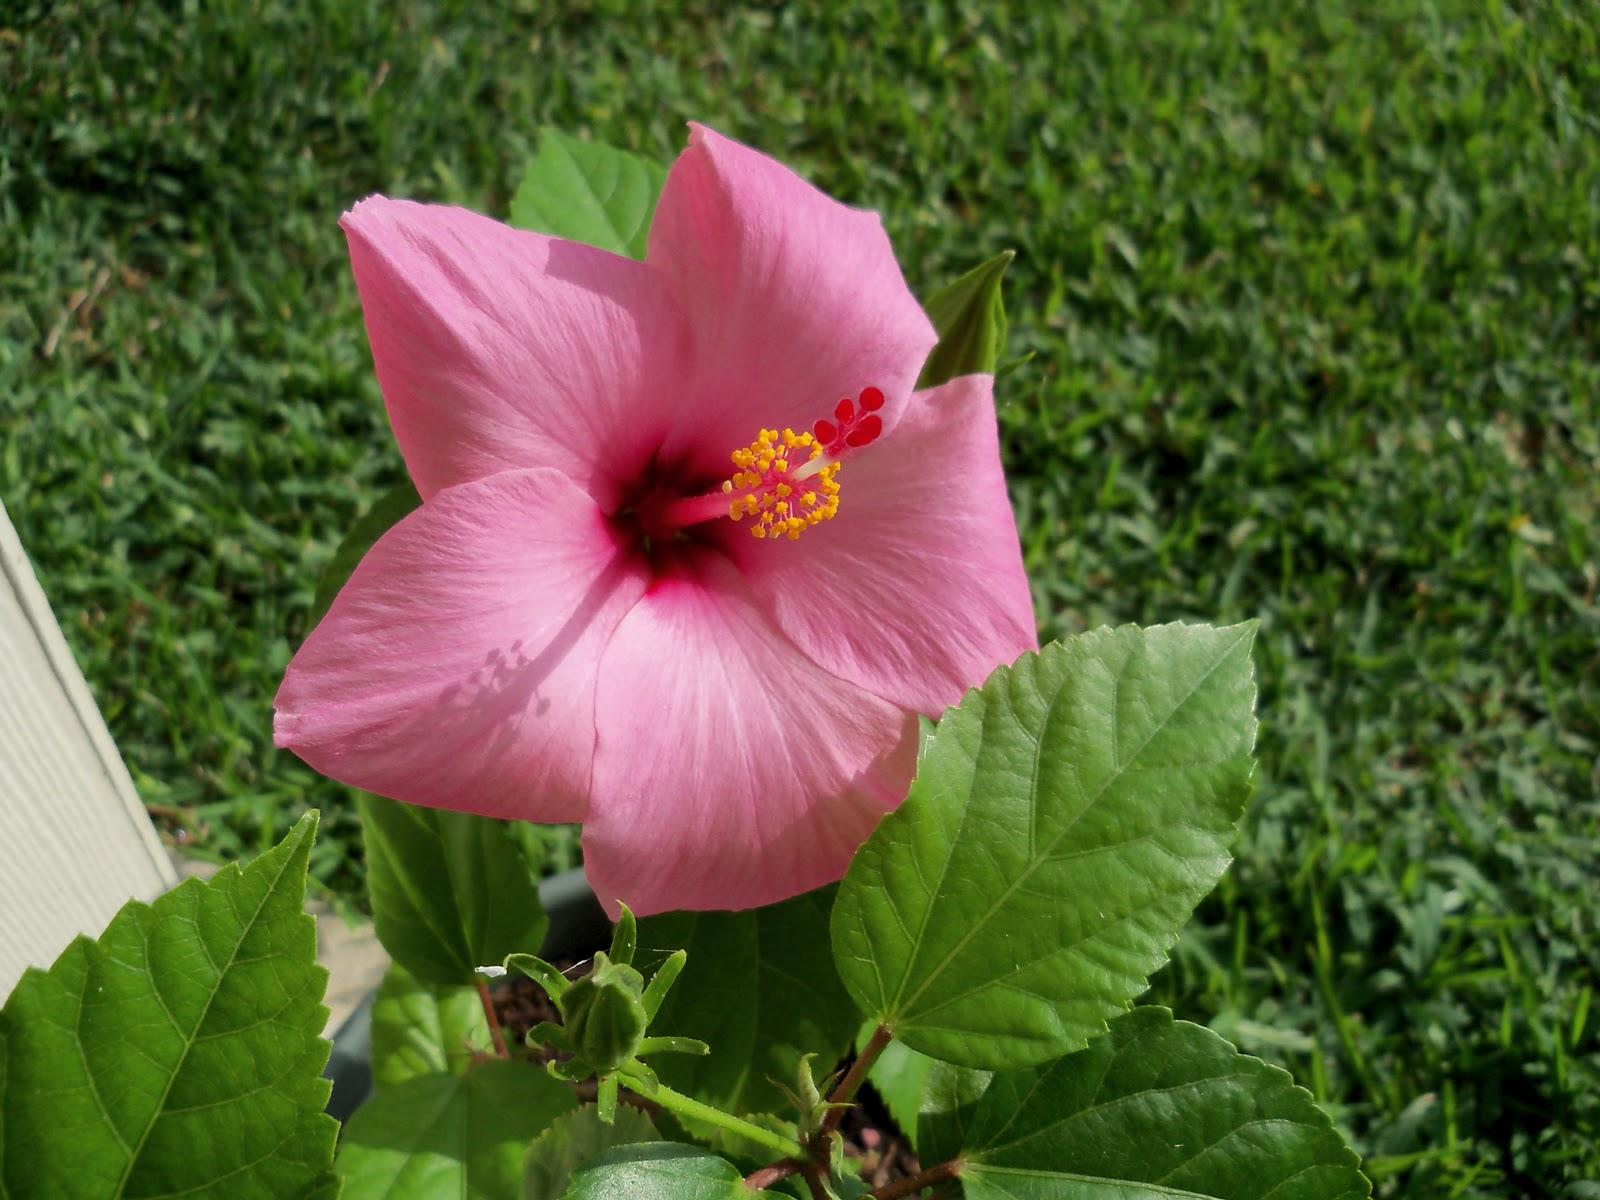 Gardening 2010, Part Two - 101_2340.JPG